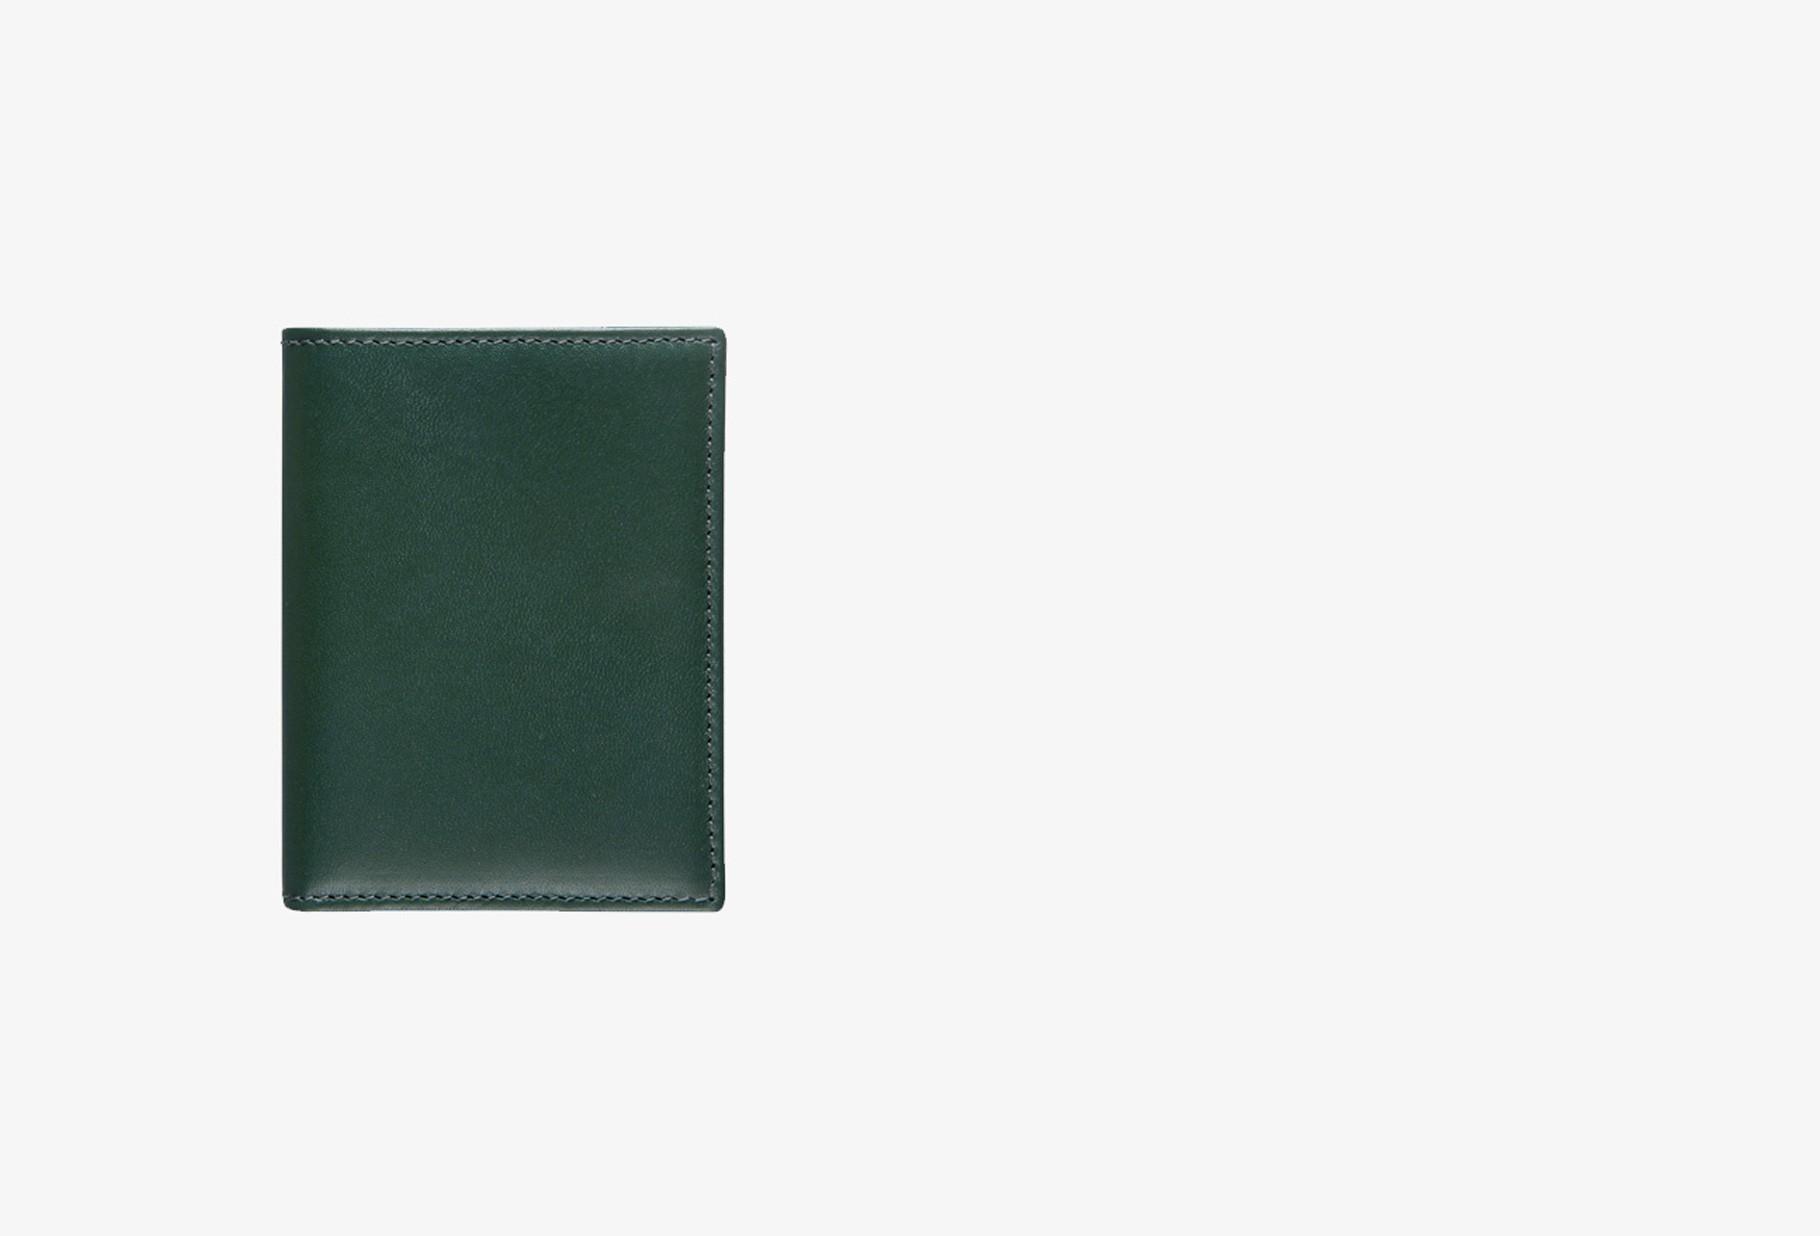 COMME DES GARÇONS WALLETS / Cdg leather wallet classic Sa0641 bottle green